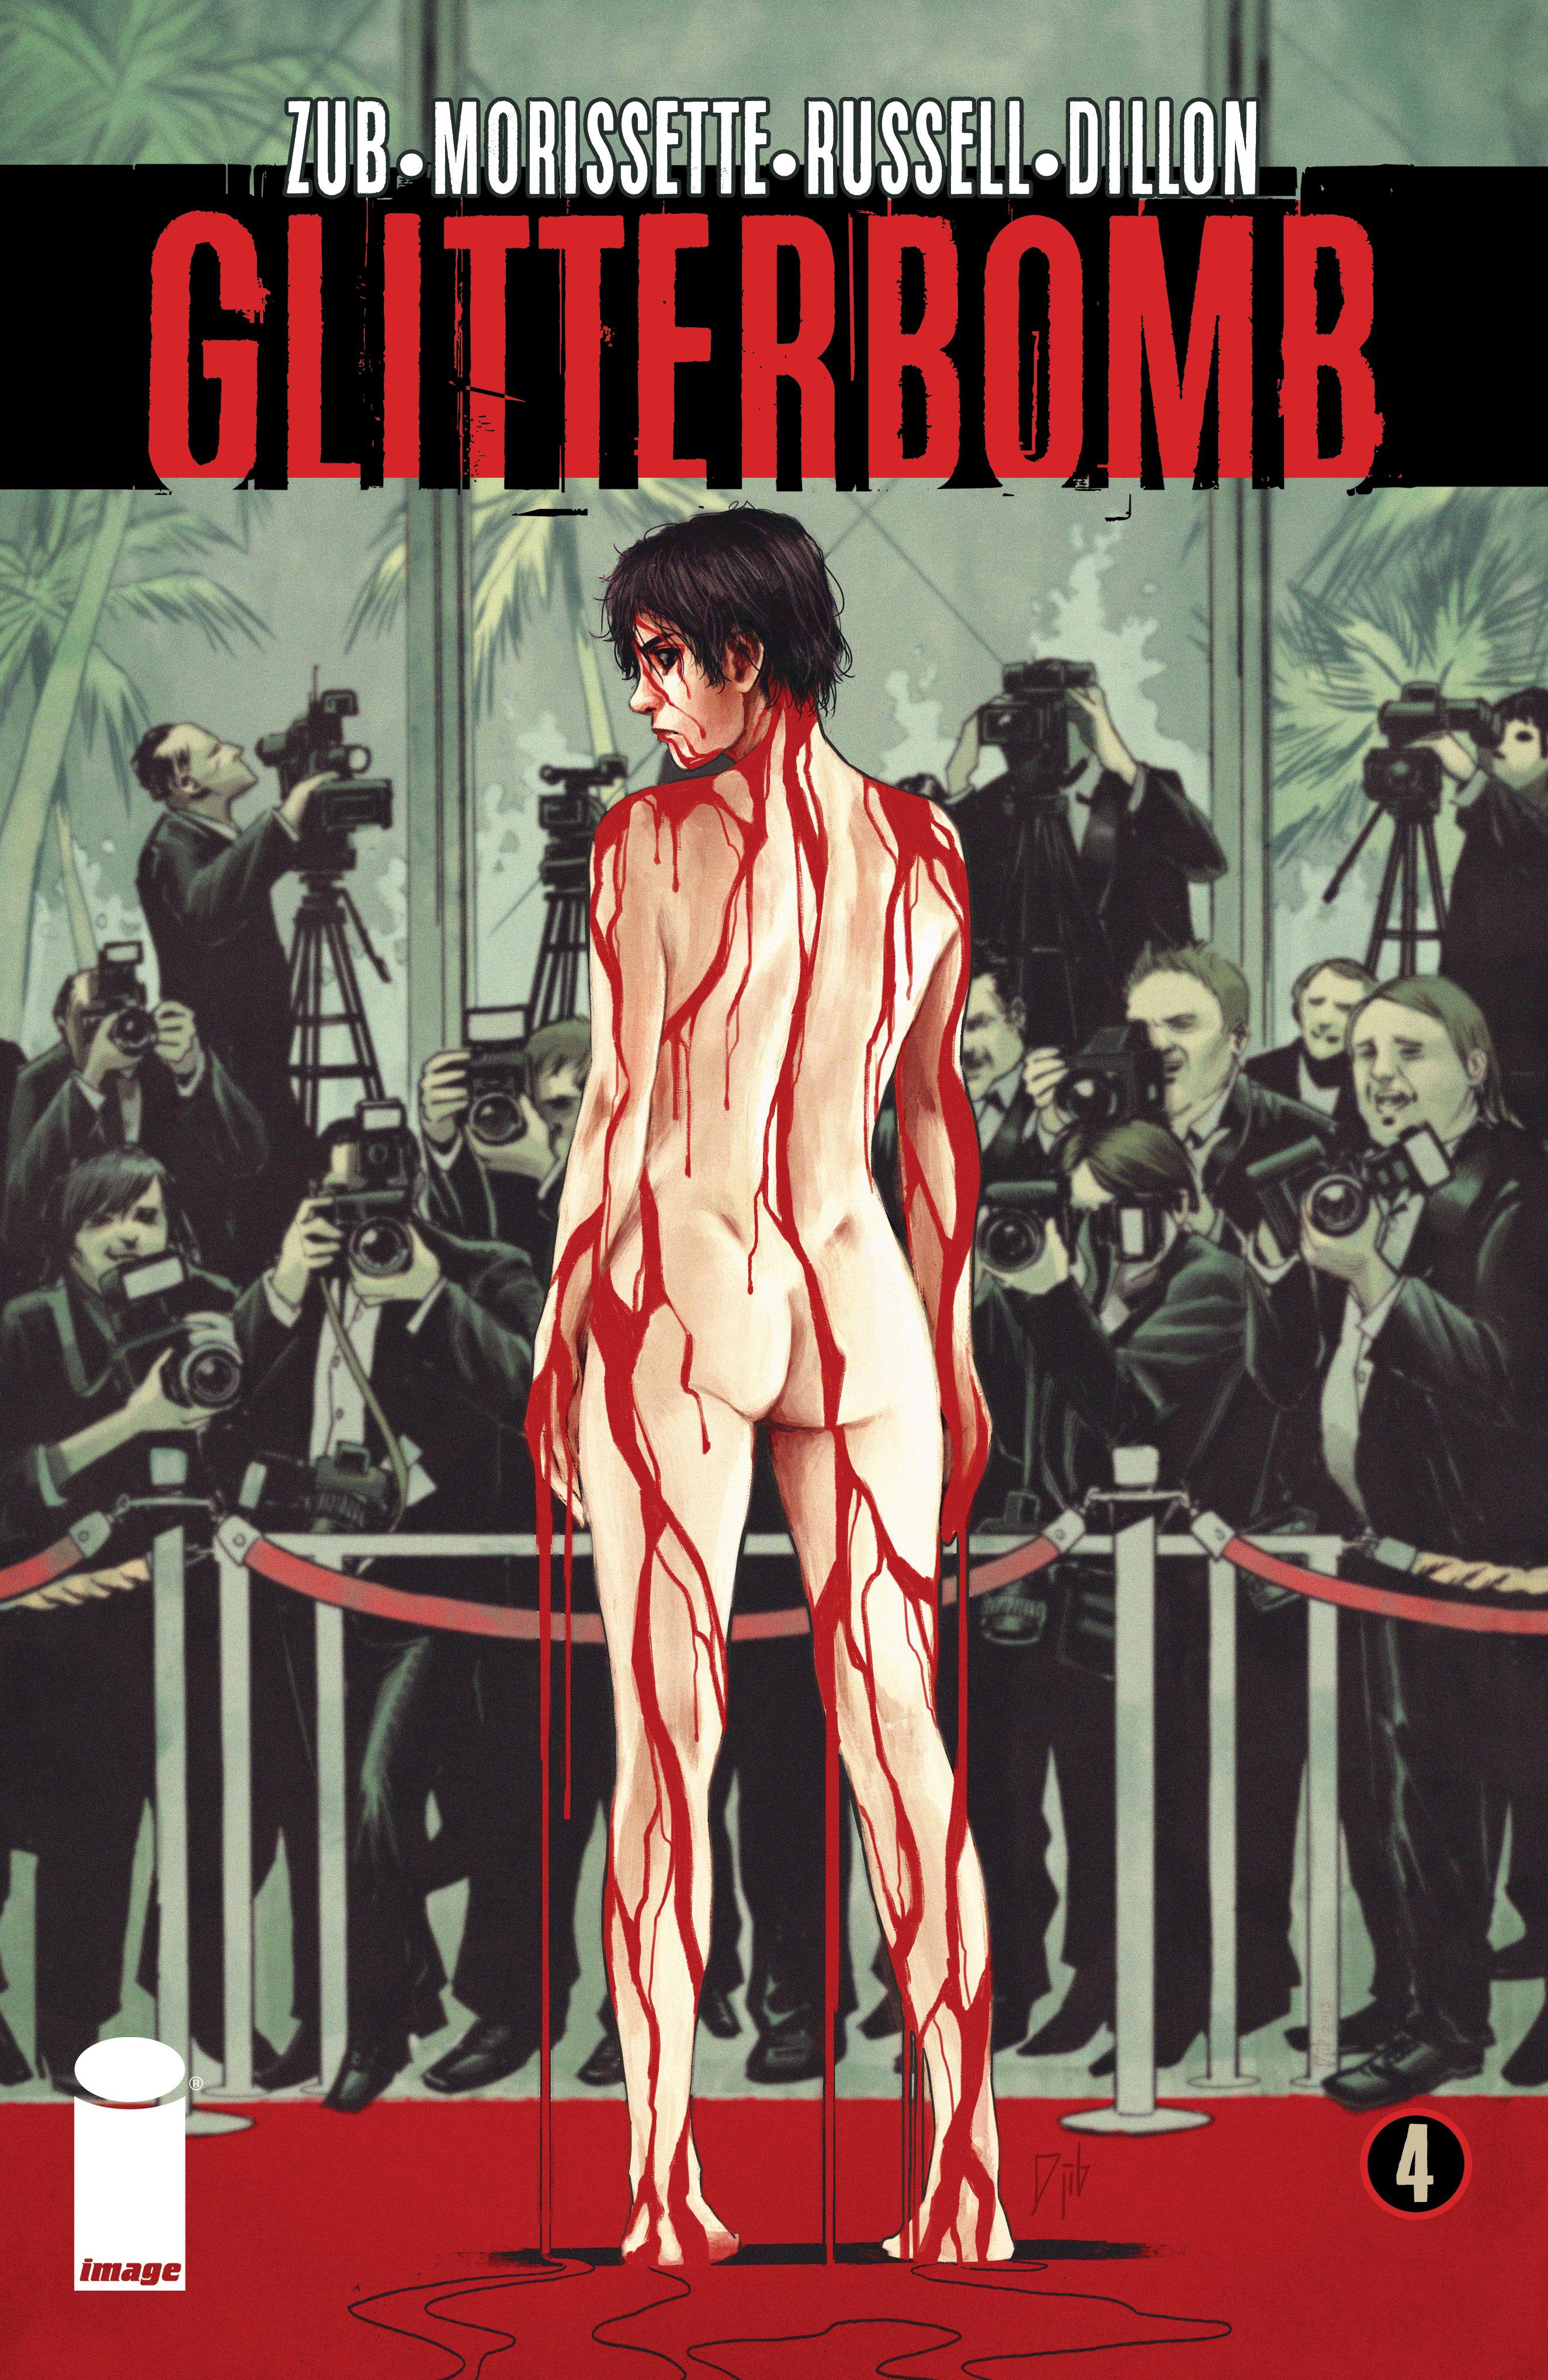 Read online Glitterbomb comic -  Issue #4 - 1